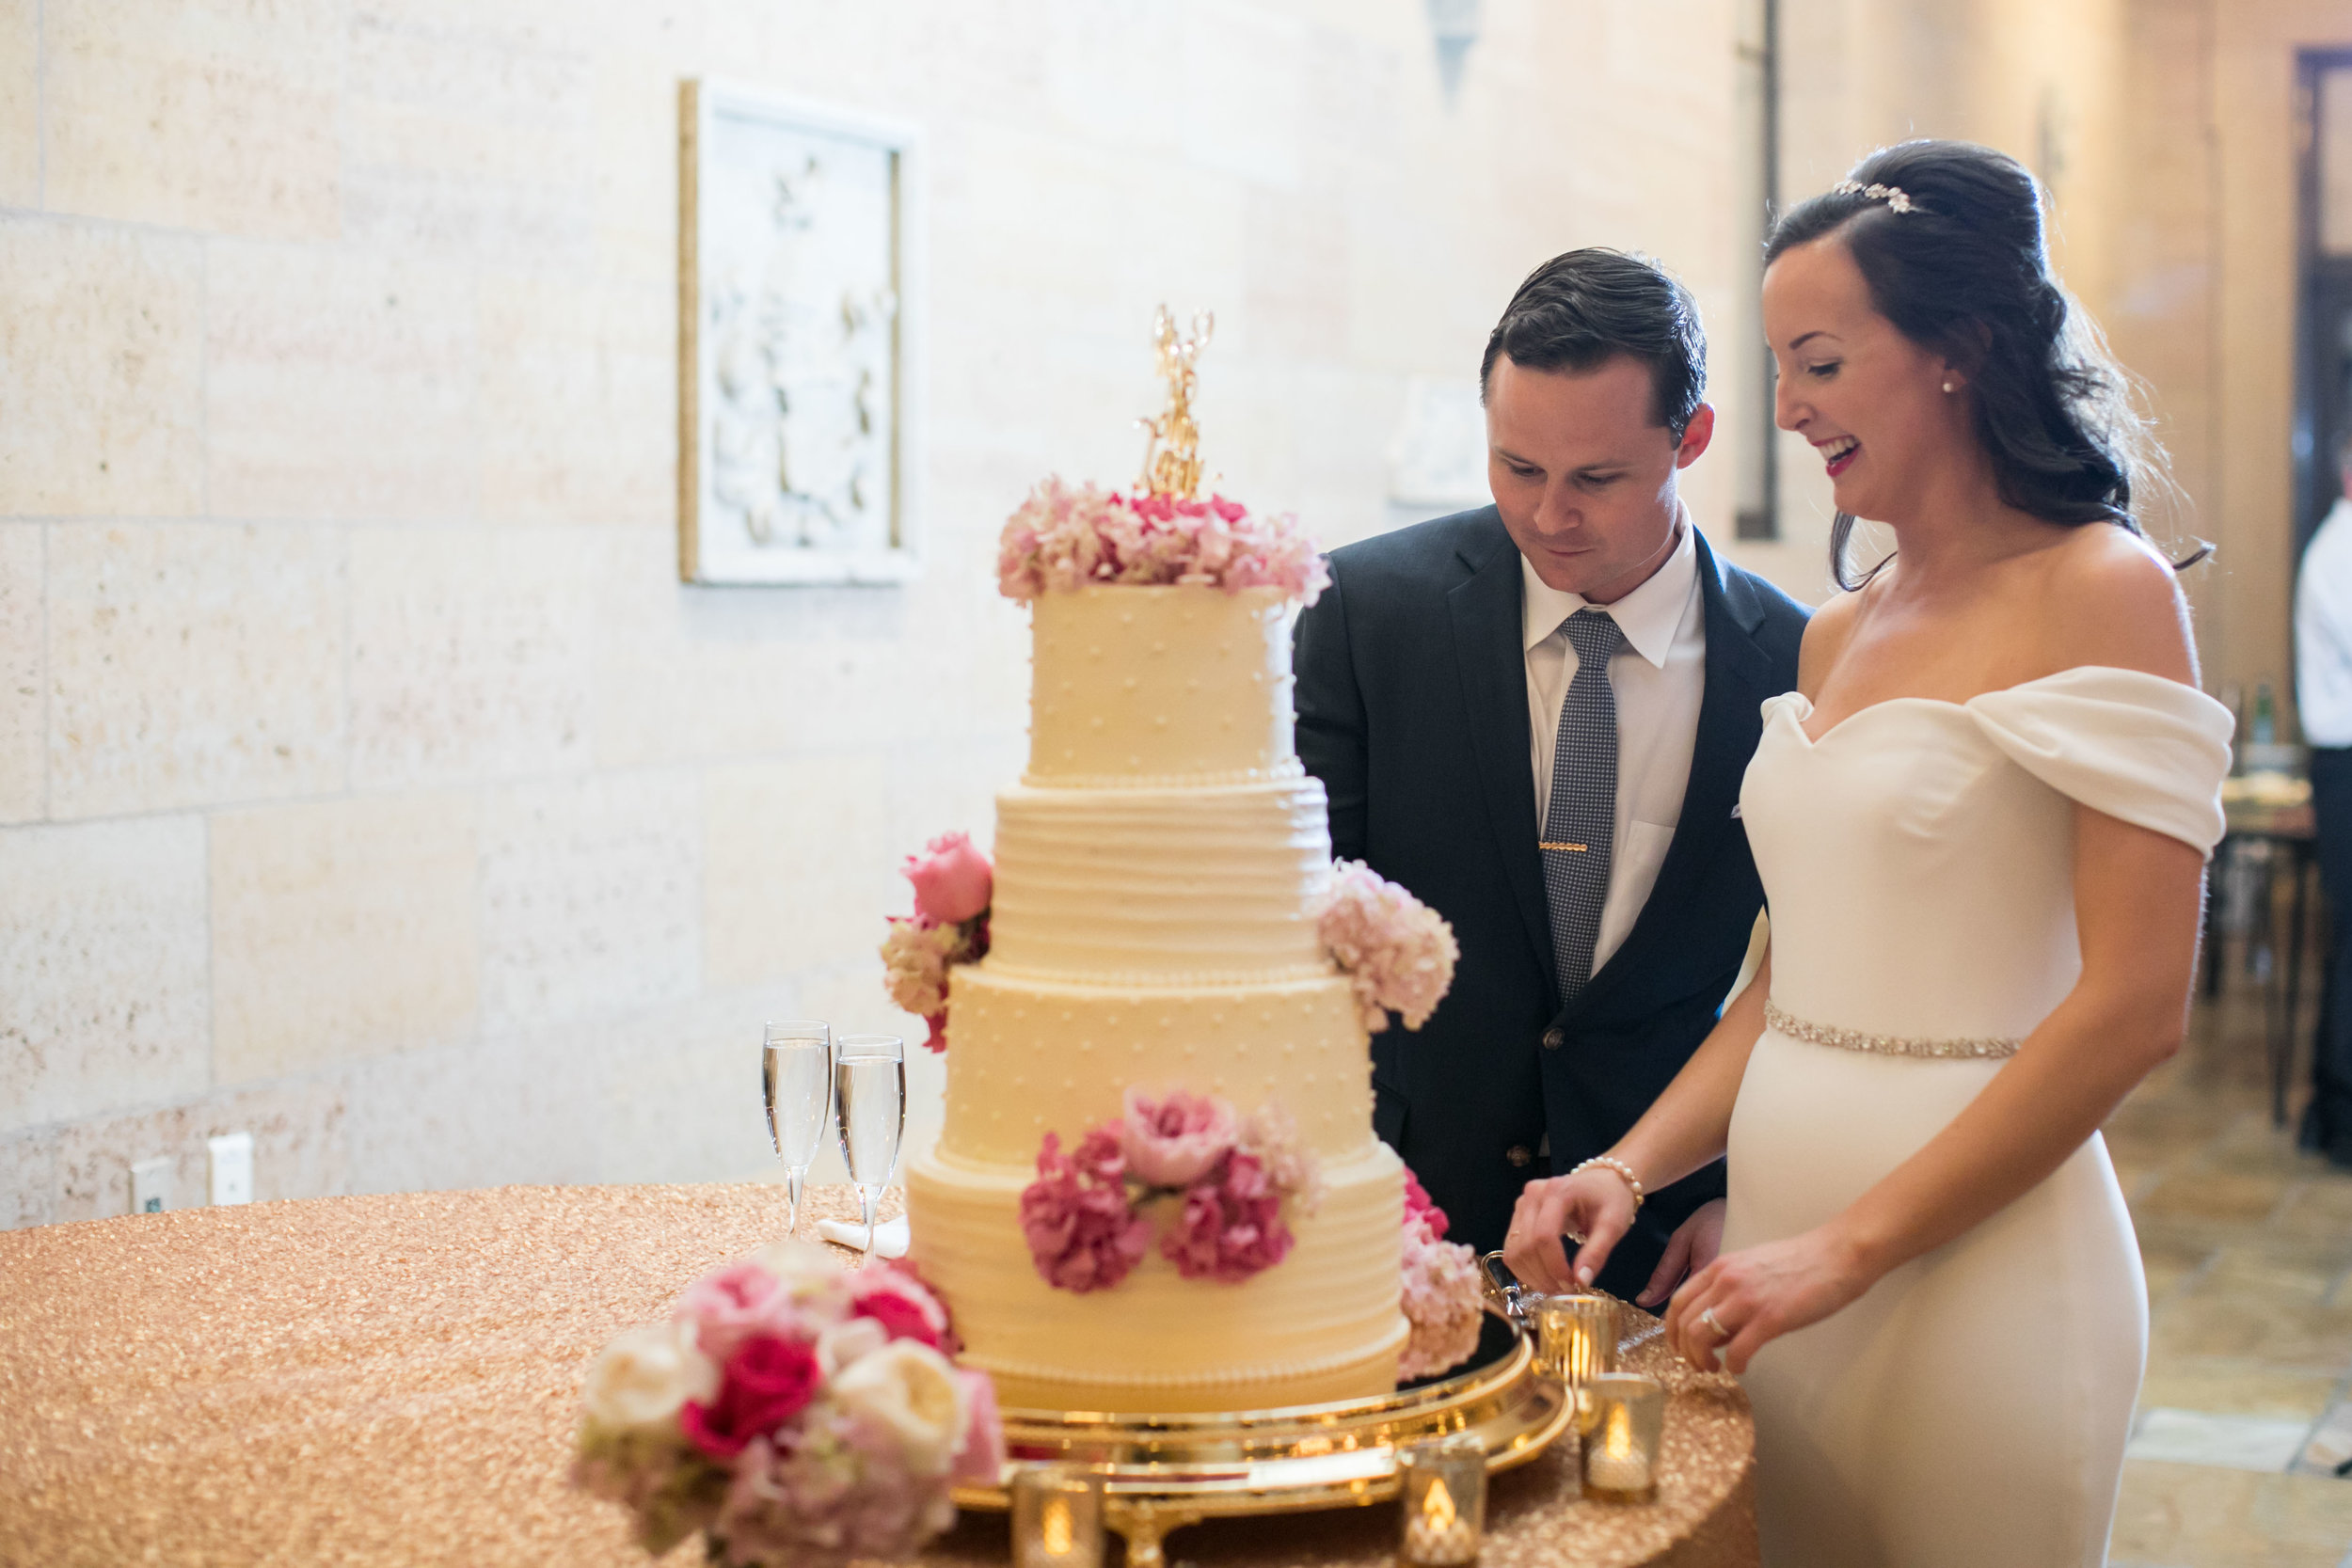 nelson-atkins-wedding-70.jpg